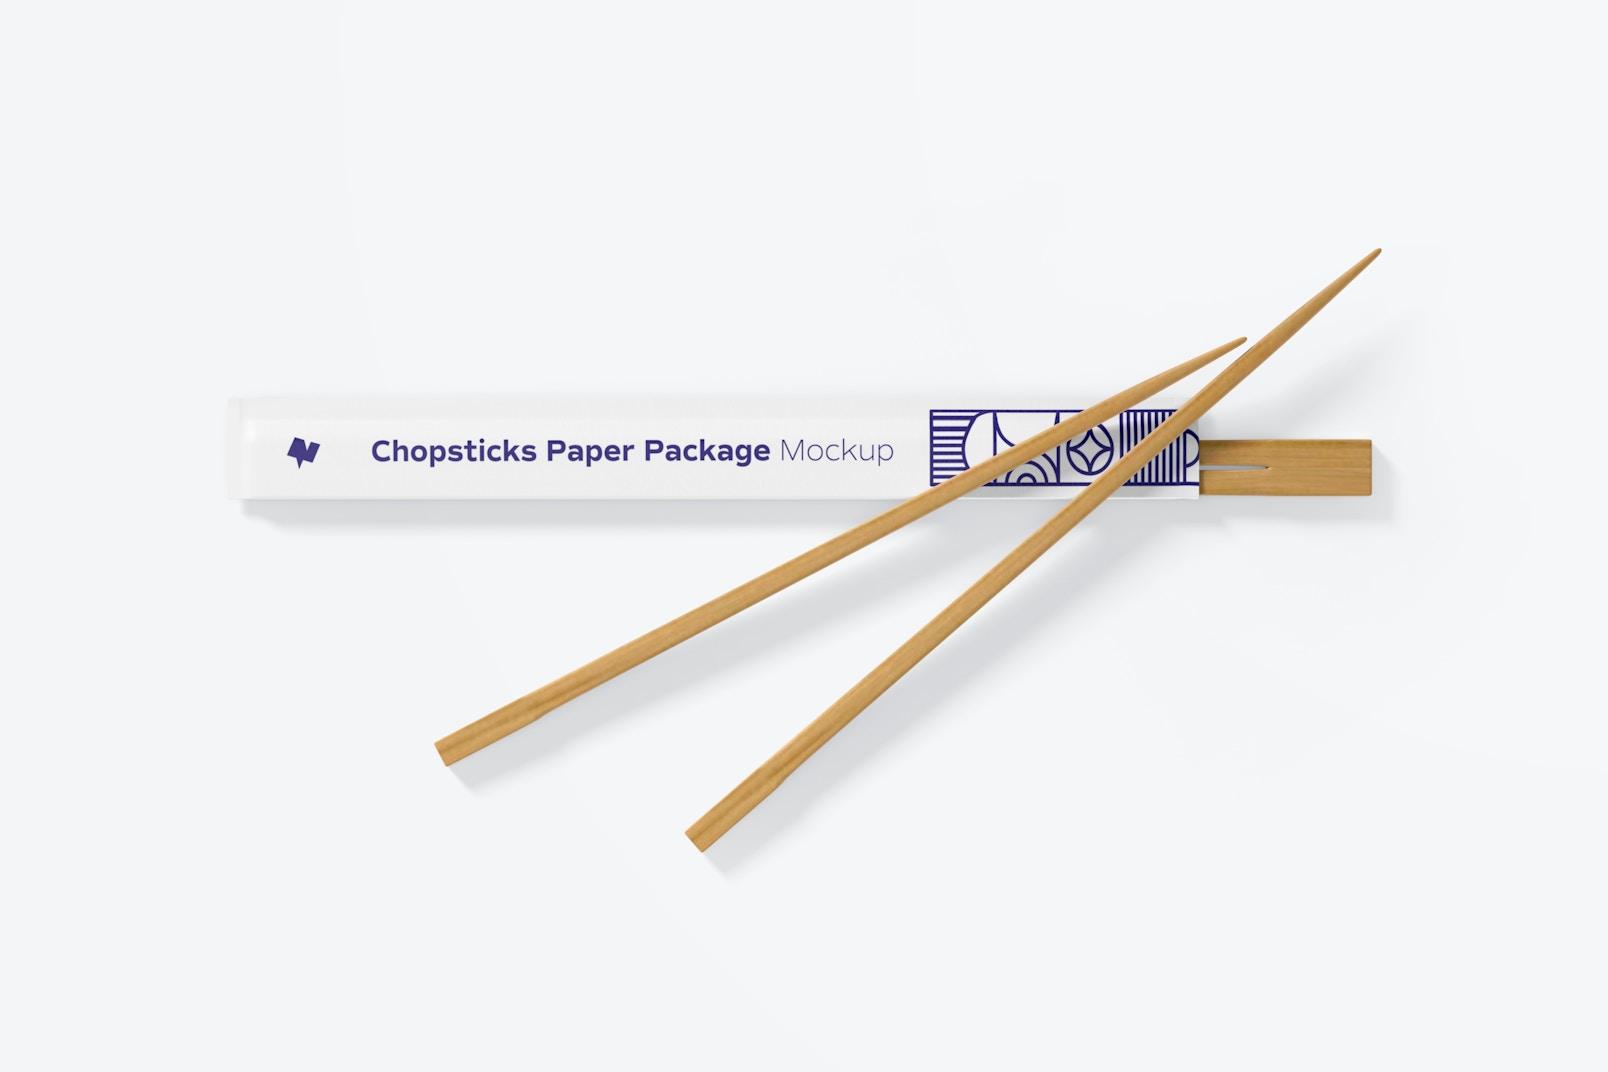 Chopsticks Paper Package Mockup